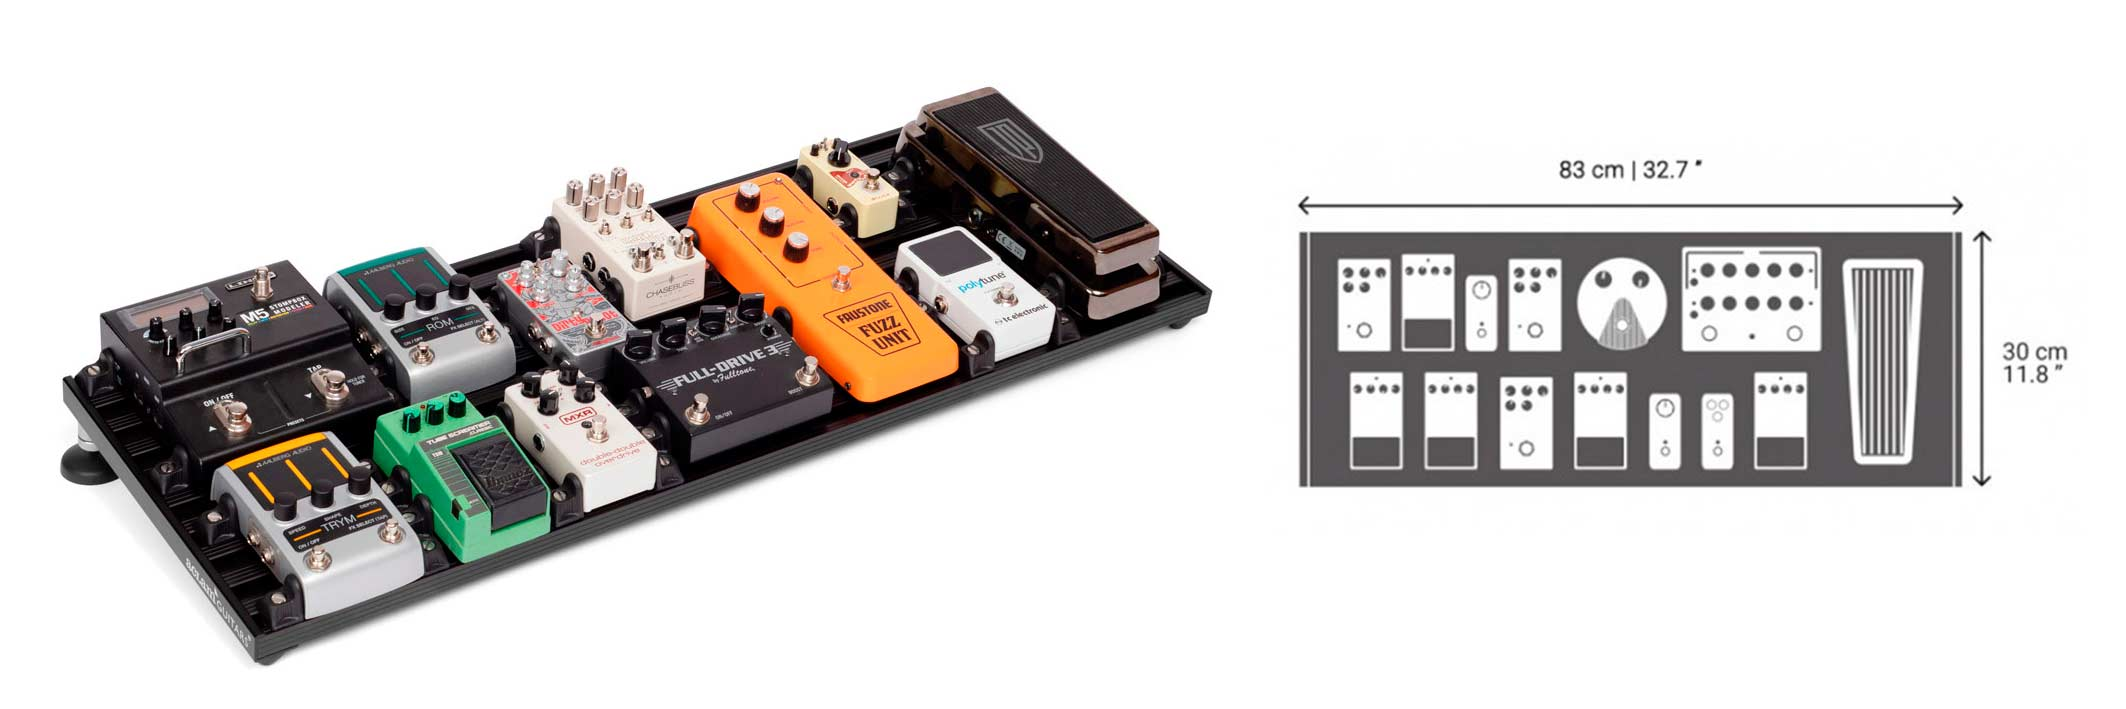 Aclam pedalboard size L2